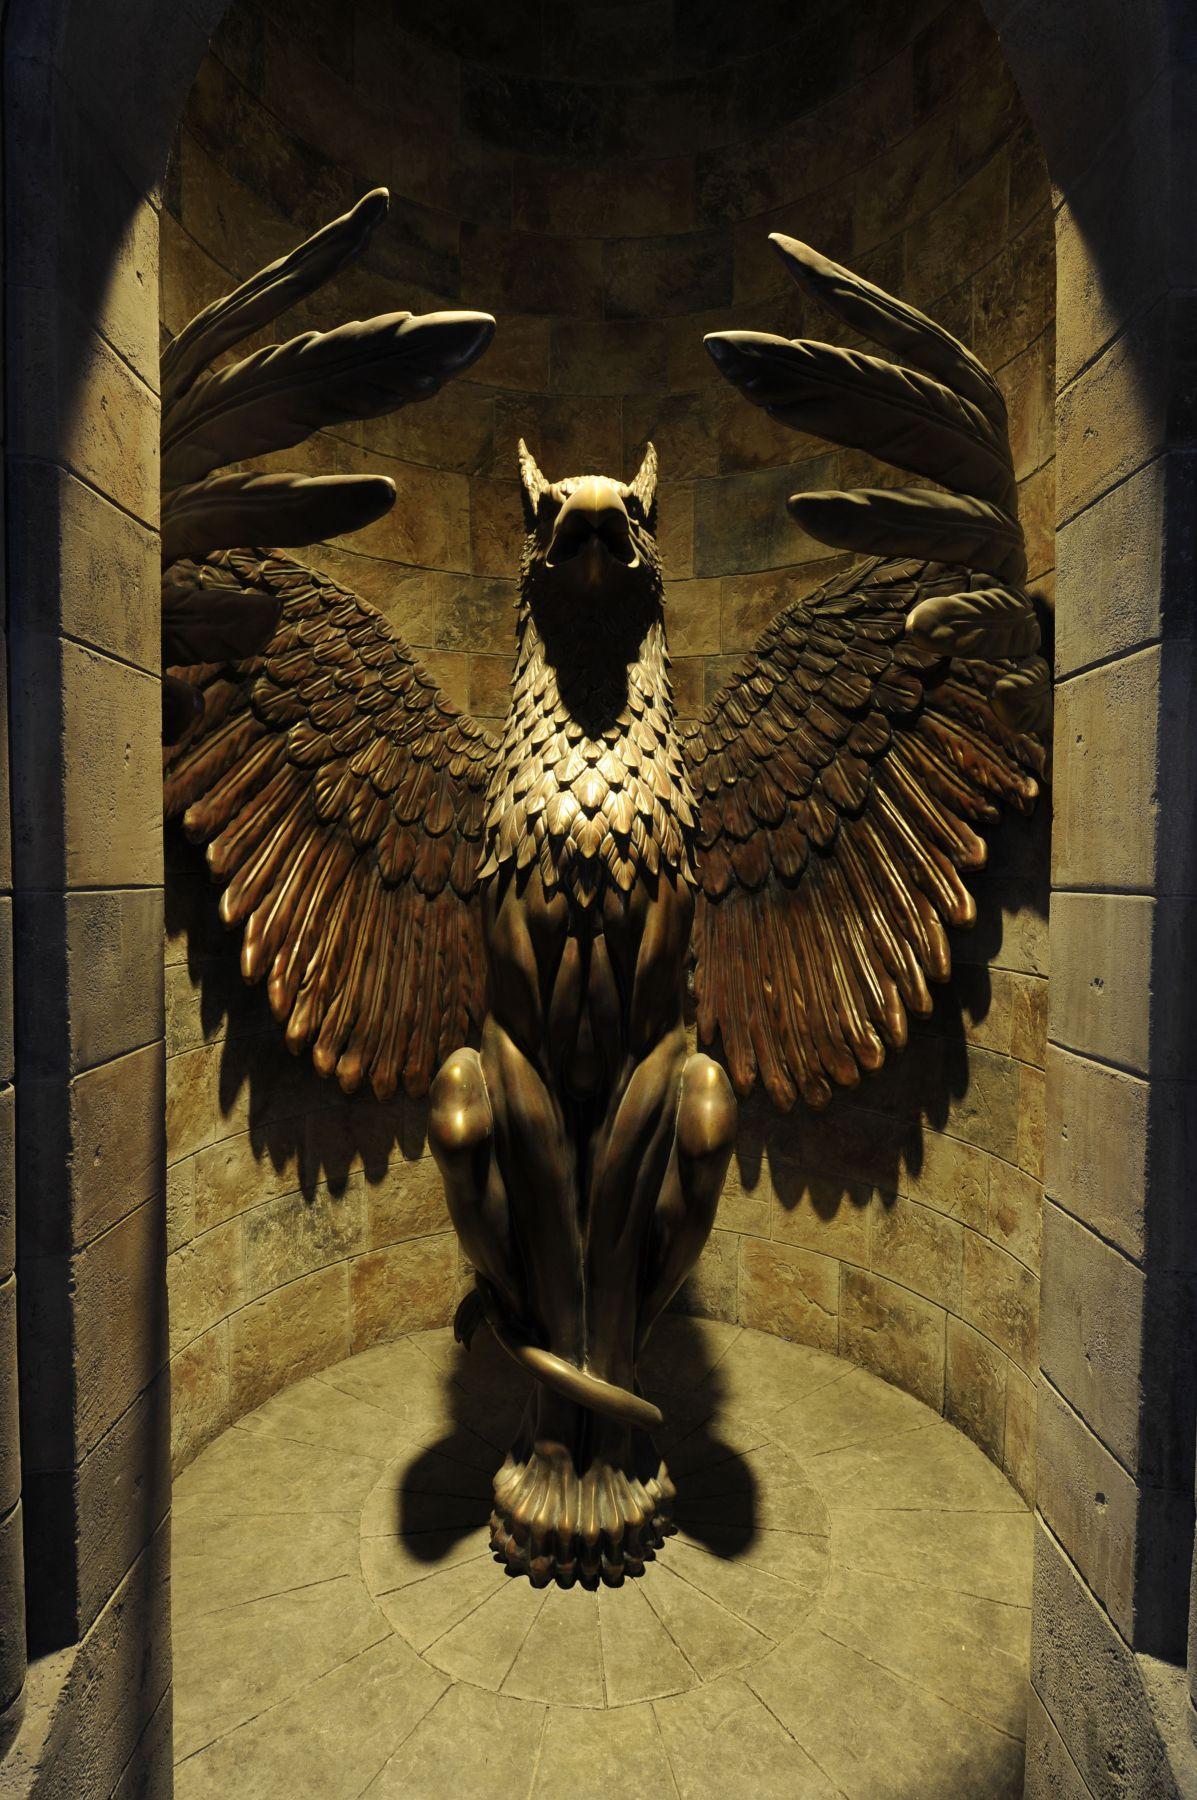 Good Wallpaper Harry Potter Concept Art - 04_DSC4419  You Should Have_279434.jpg